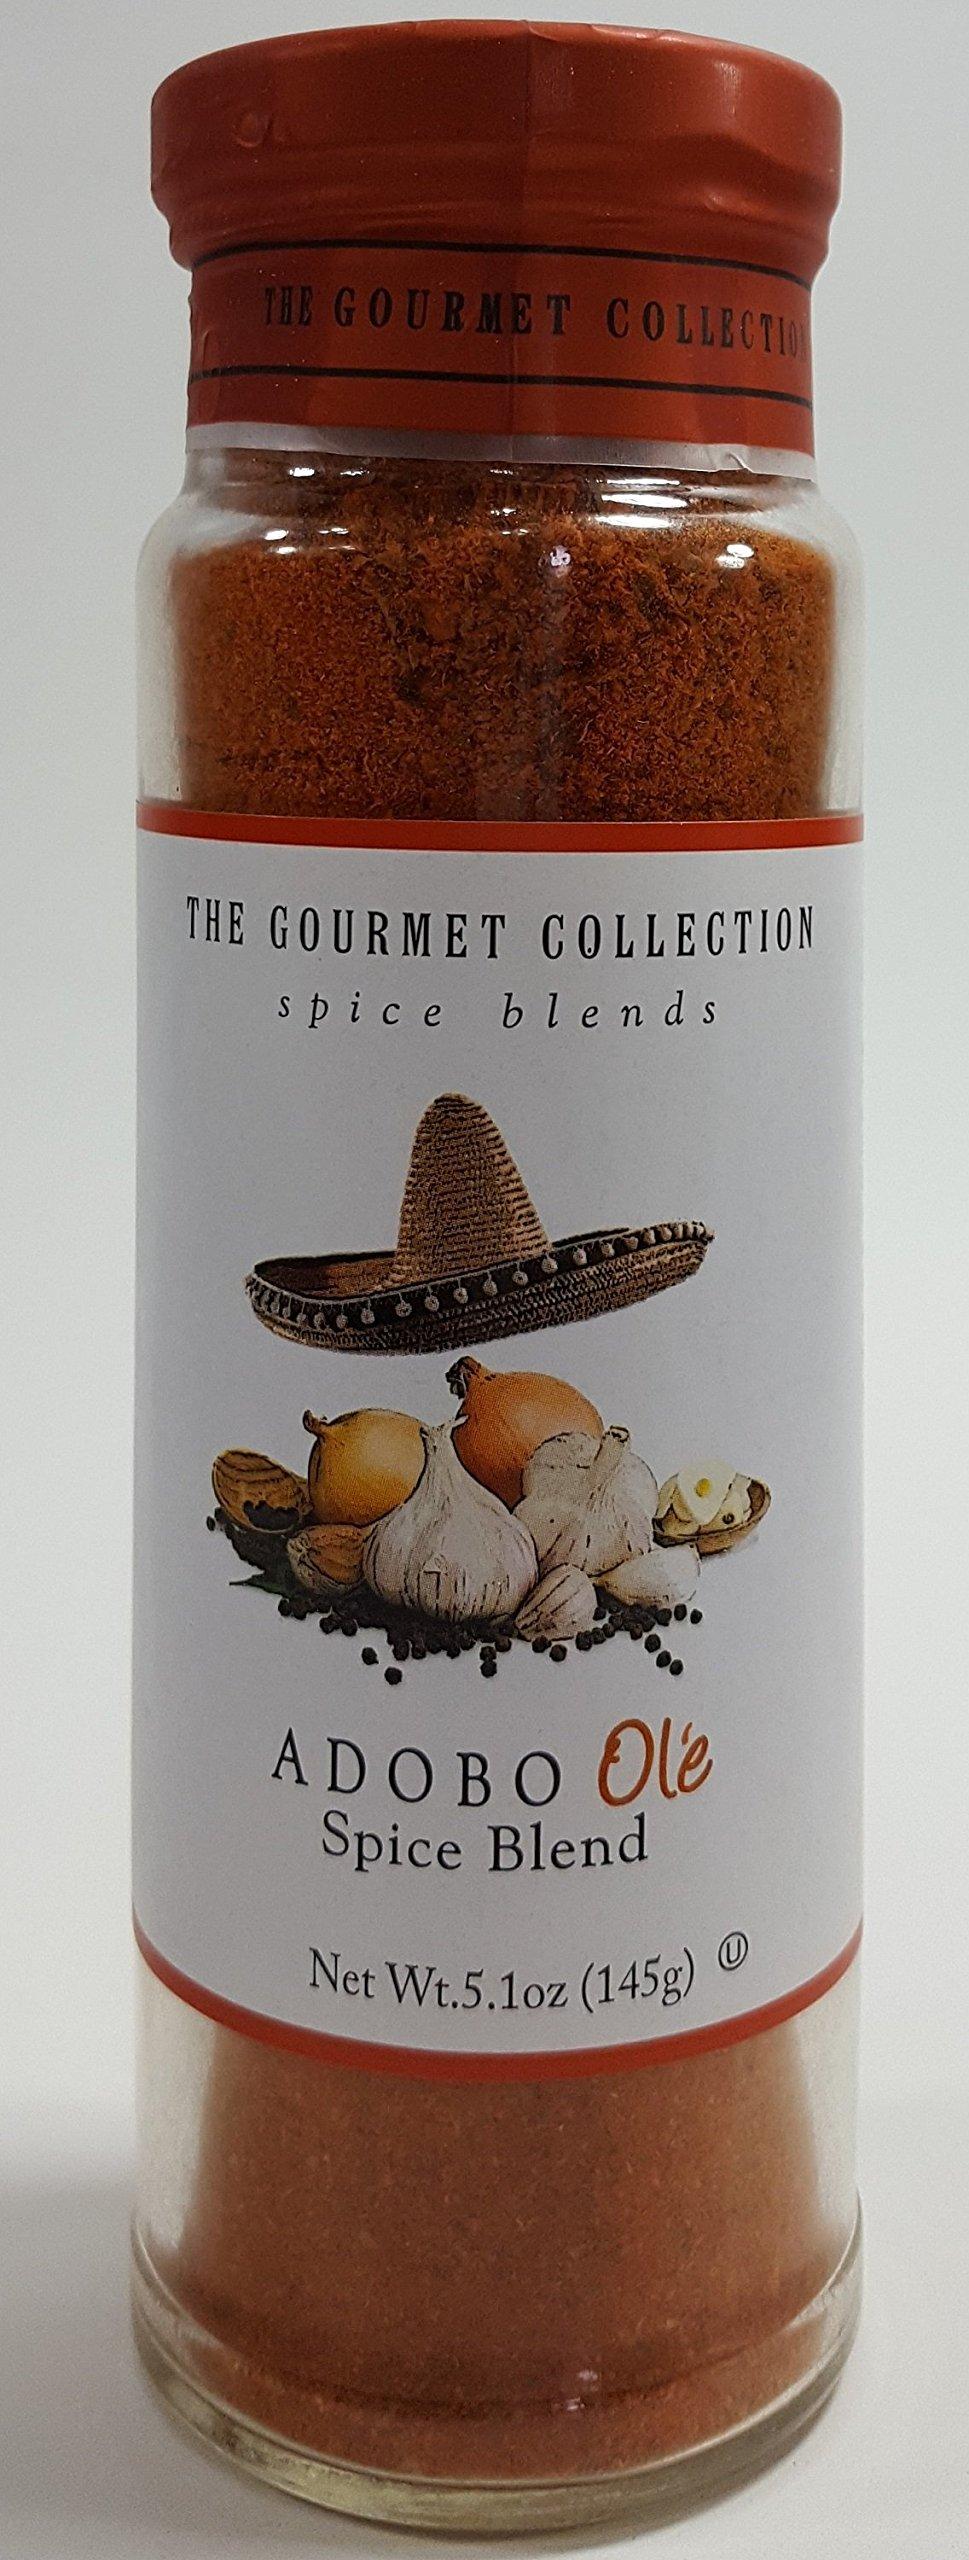 The Gourmet Collection Adobo Ol'e Spice Blend 4.6 oz